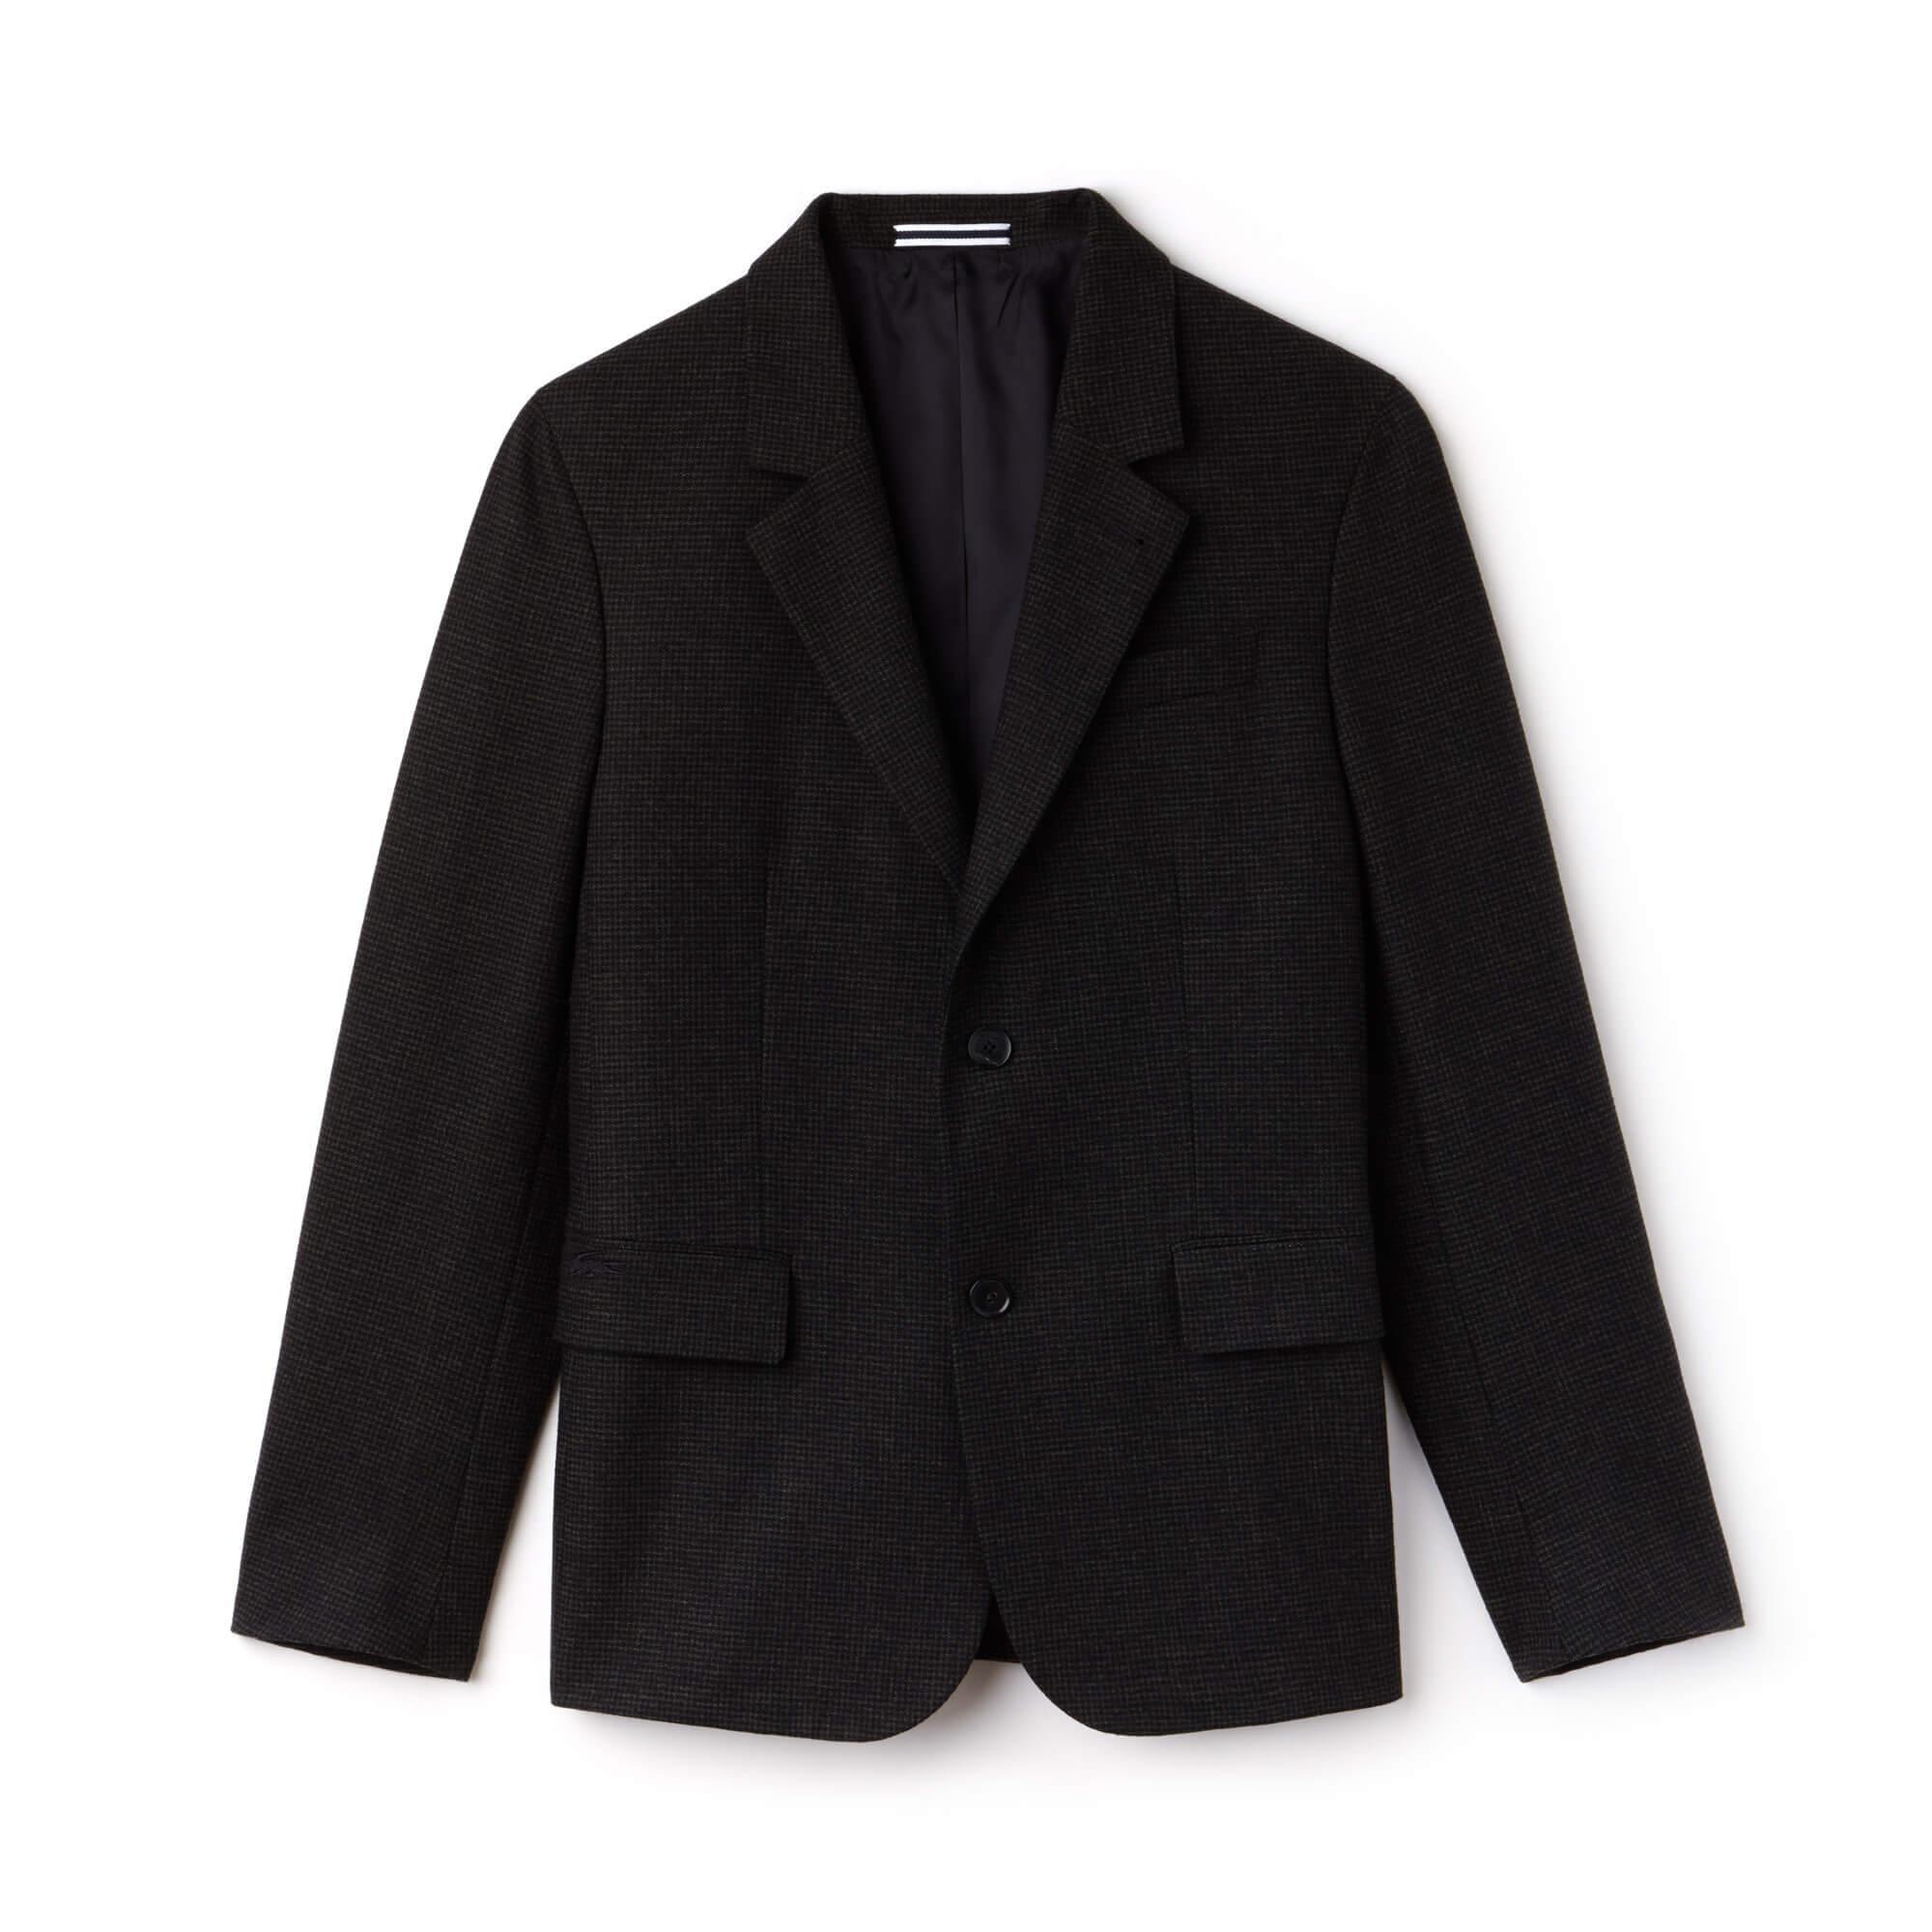 Lacoste Erkek Siyah Ceket